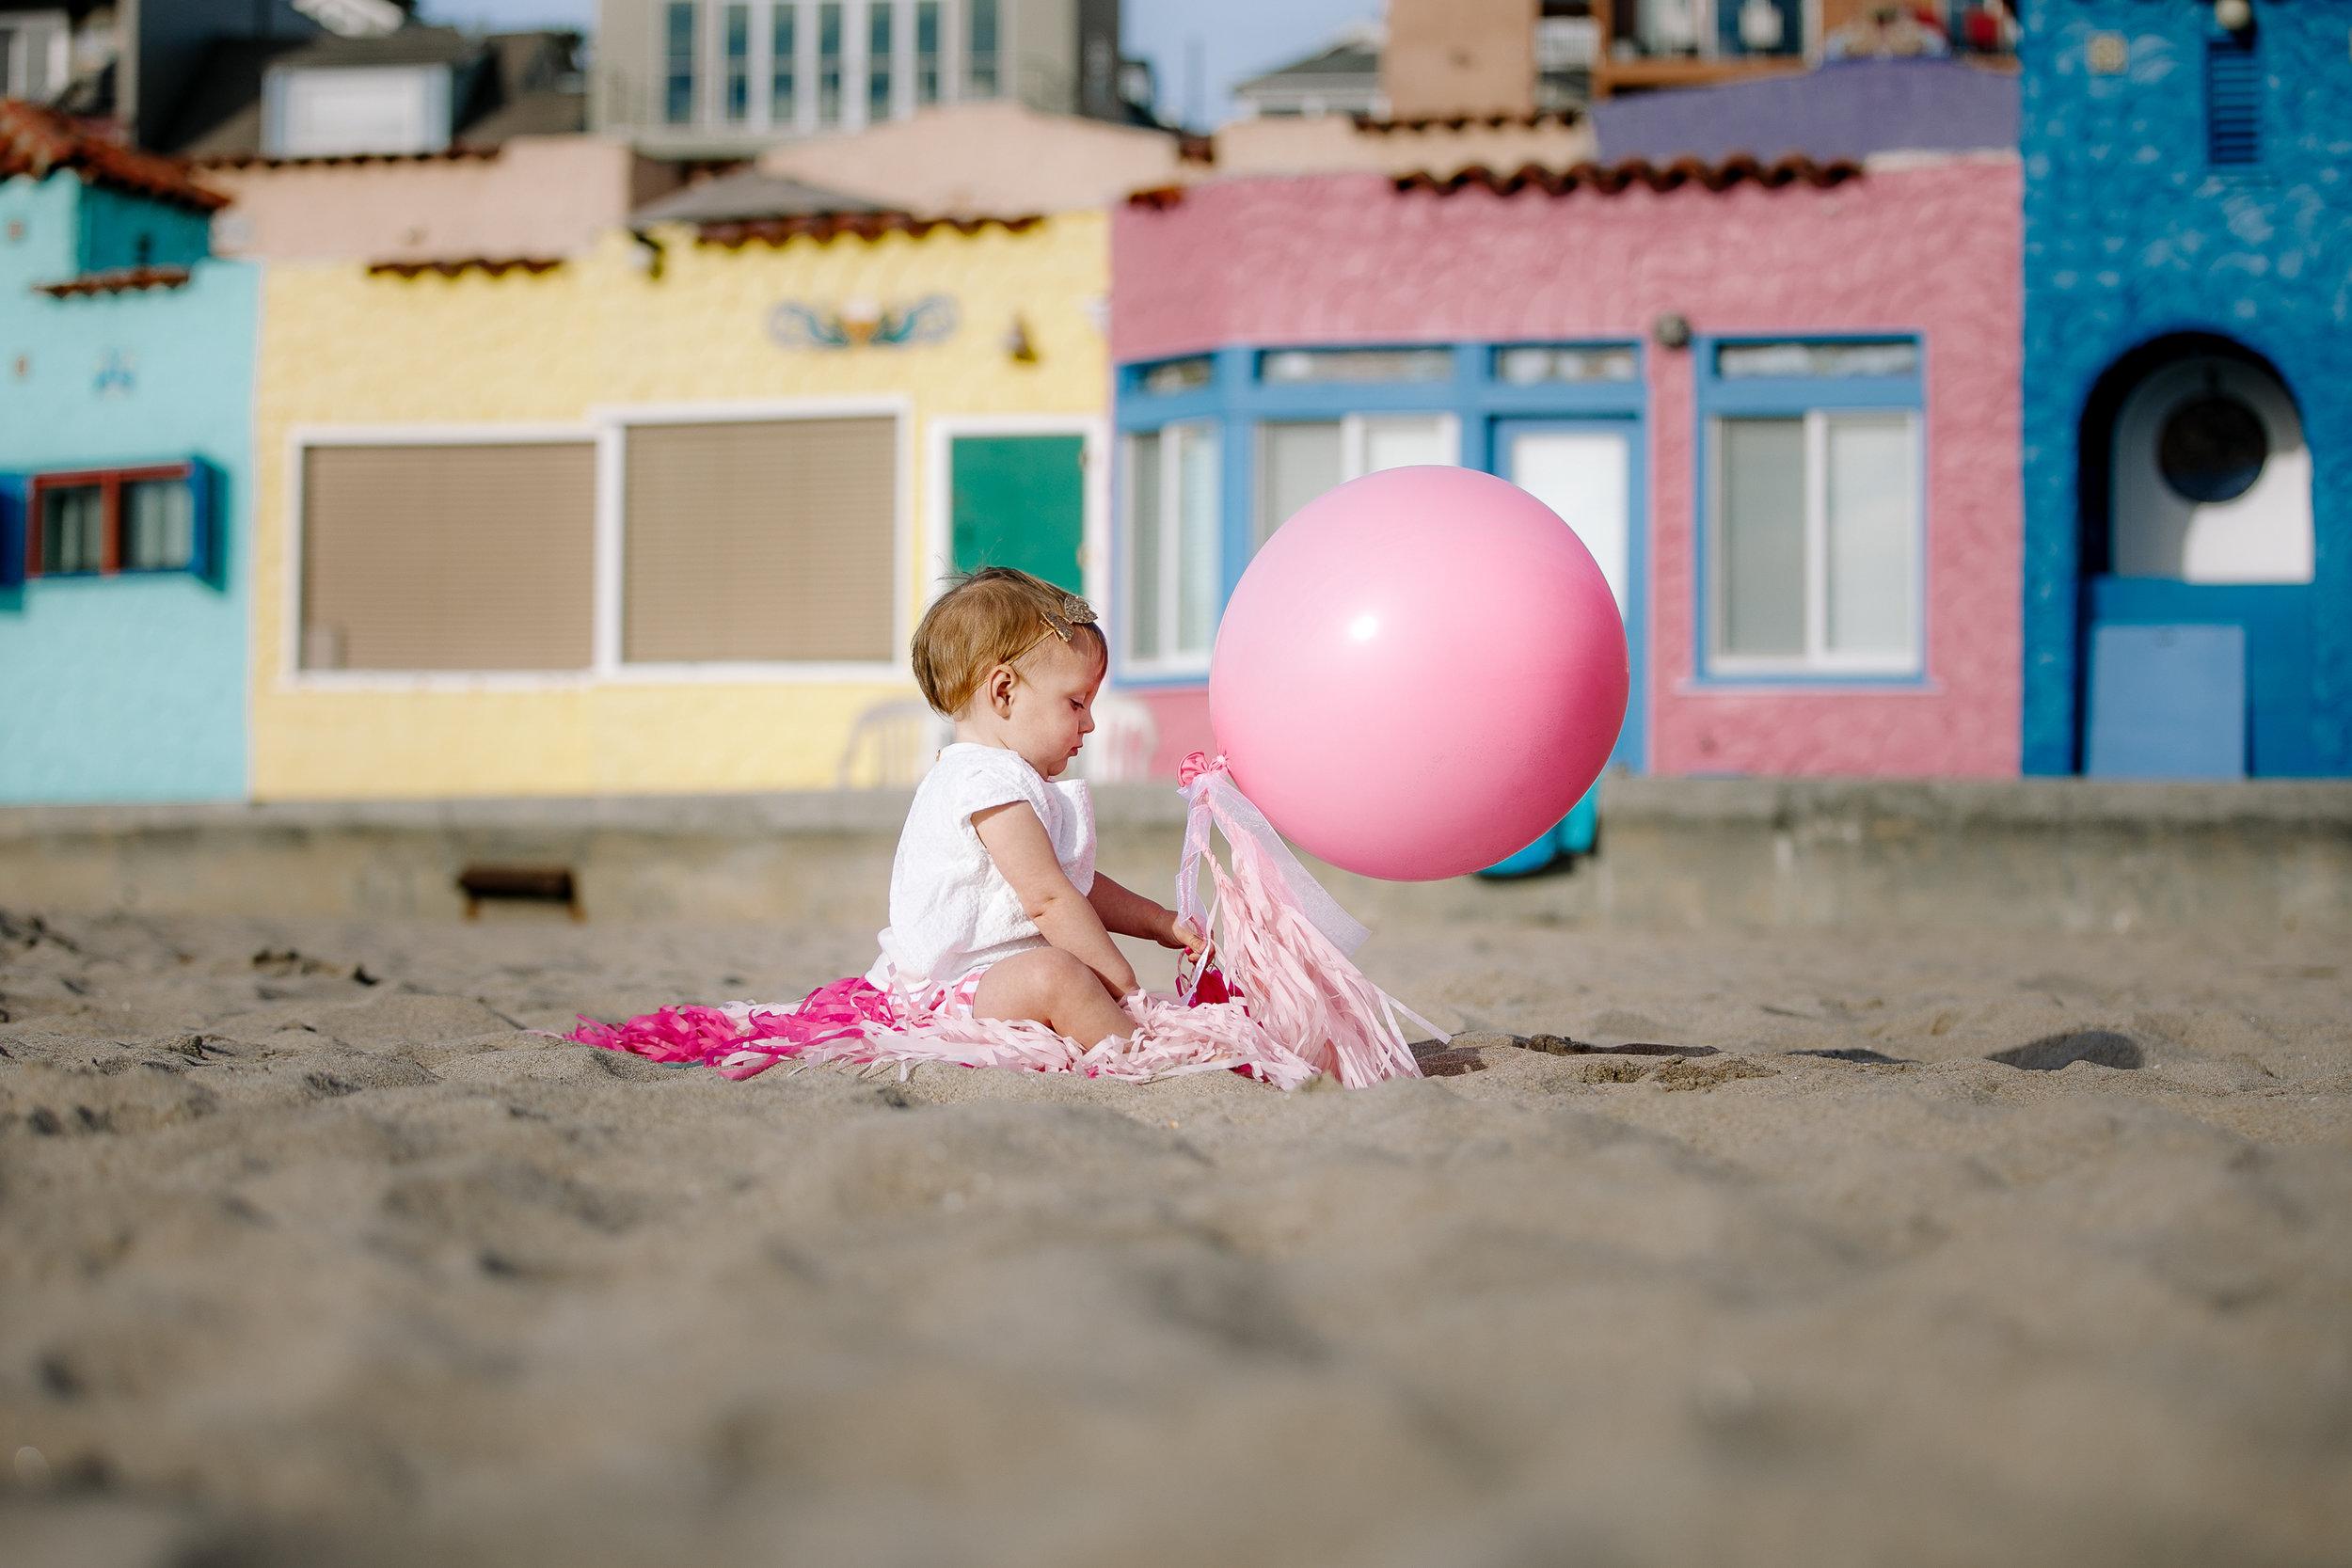 Archer Inspired Photography Lifestyle Family Capitola Beach California Documentary Photographer First Birthday Shoot-6.jpg